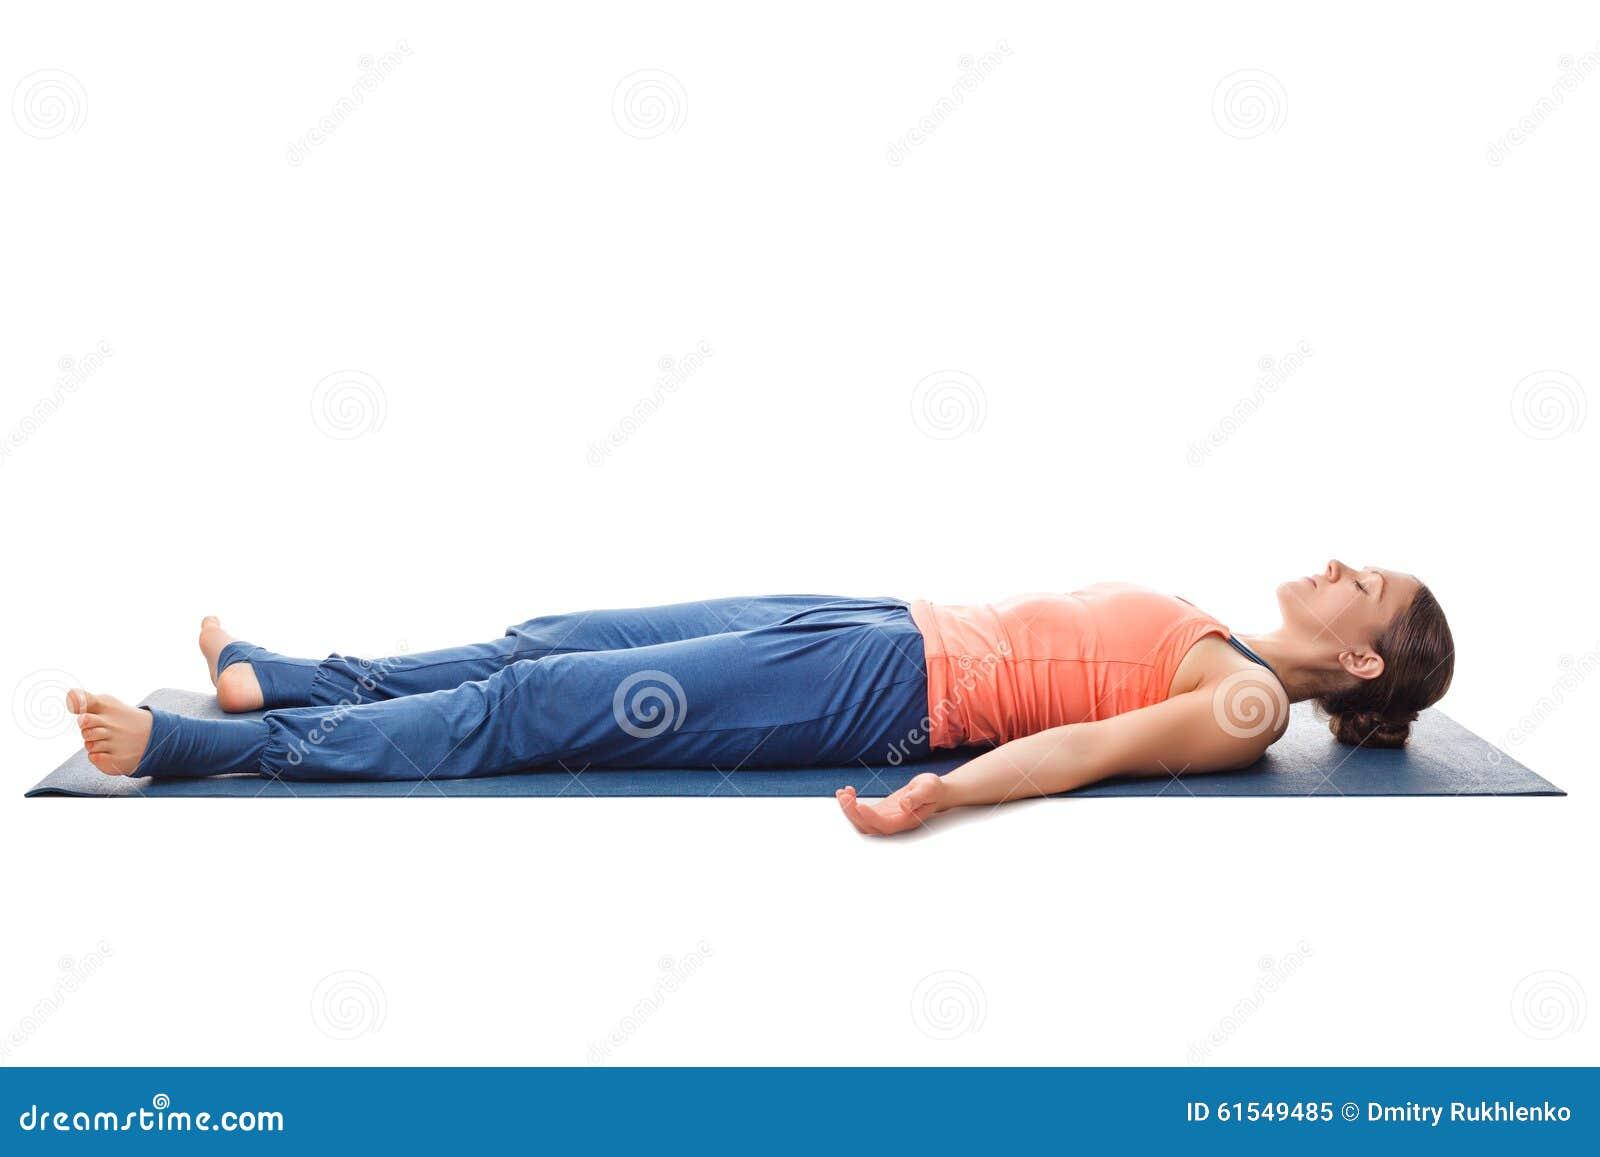 Savasana Yoga Pose Stock Photos, Images, & Pictures - 110 Images